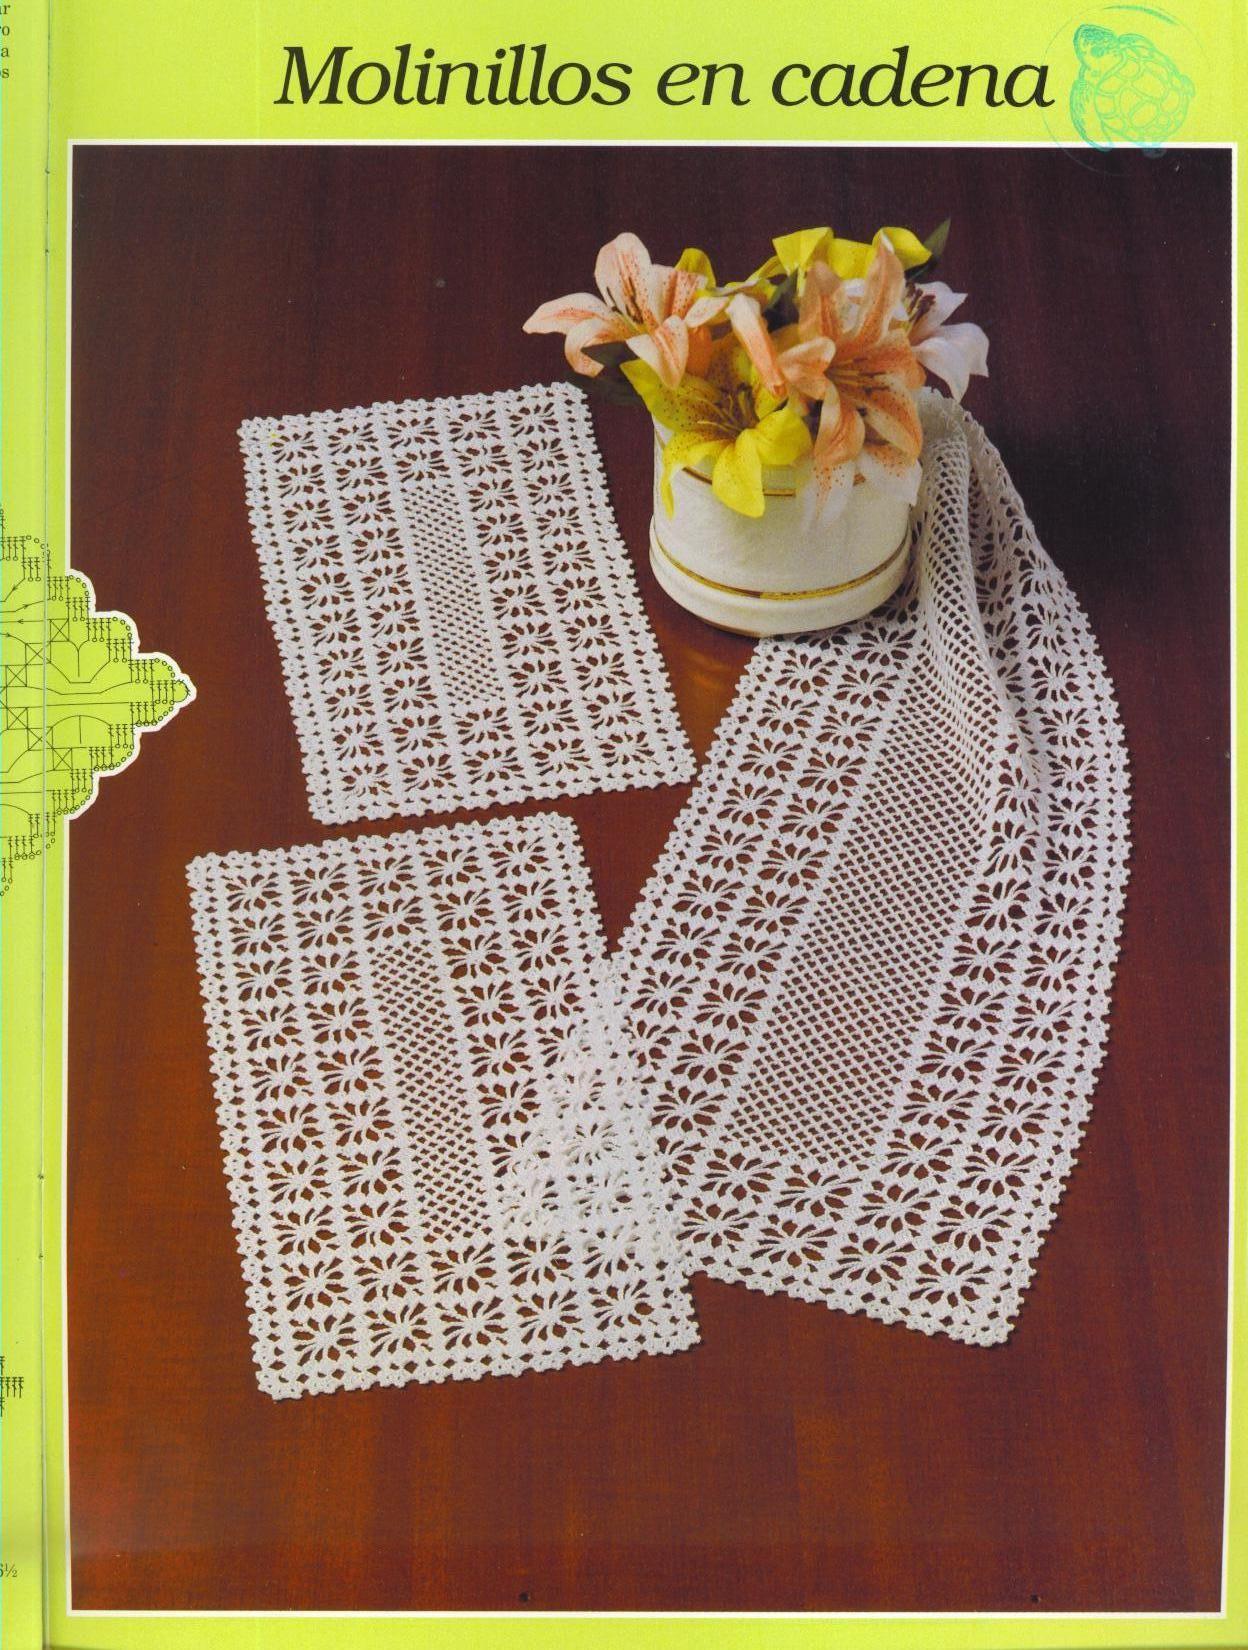 Crochet Spider Web Table Runner | Tischläufer | Pinterest ...